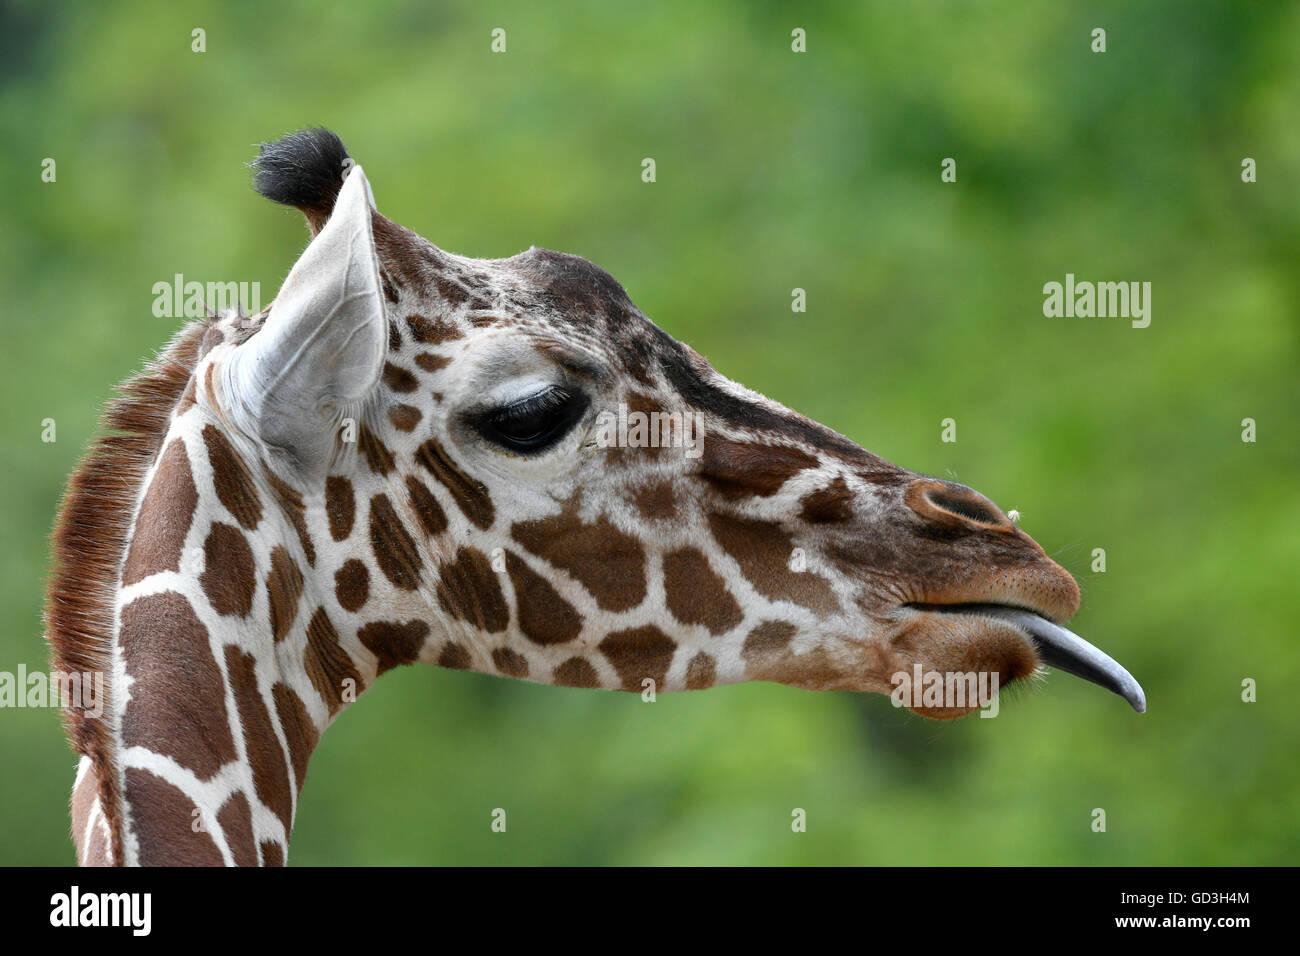 Reticulated Giraffe (Giraffa camelopardalis reticulata), portrait, sticks out tongue, captive Stock Photo